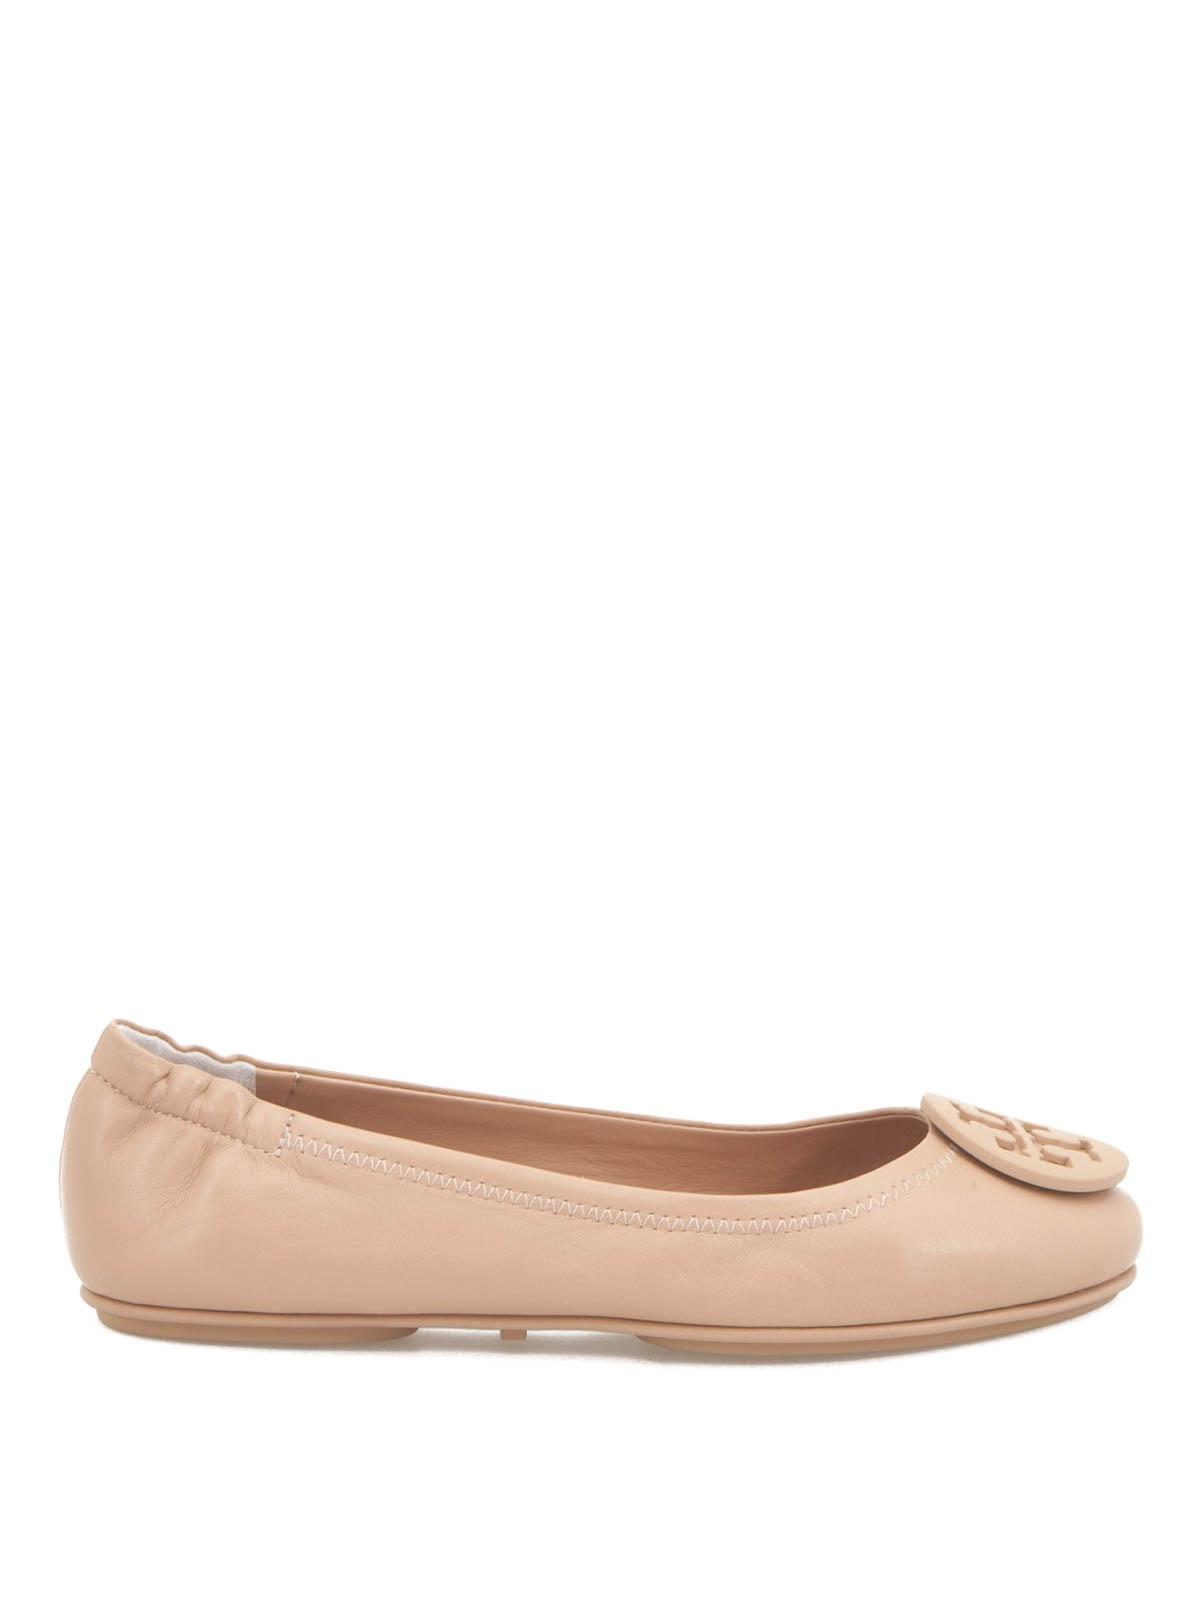 00dc23c16c2 Tory Burch - Minnie folding flats - flat shoes - 51158251 254 ...